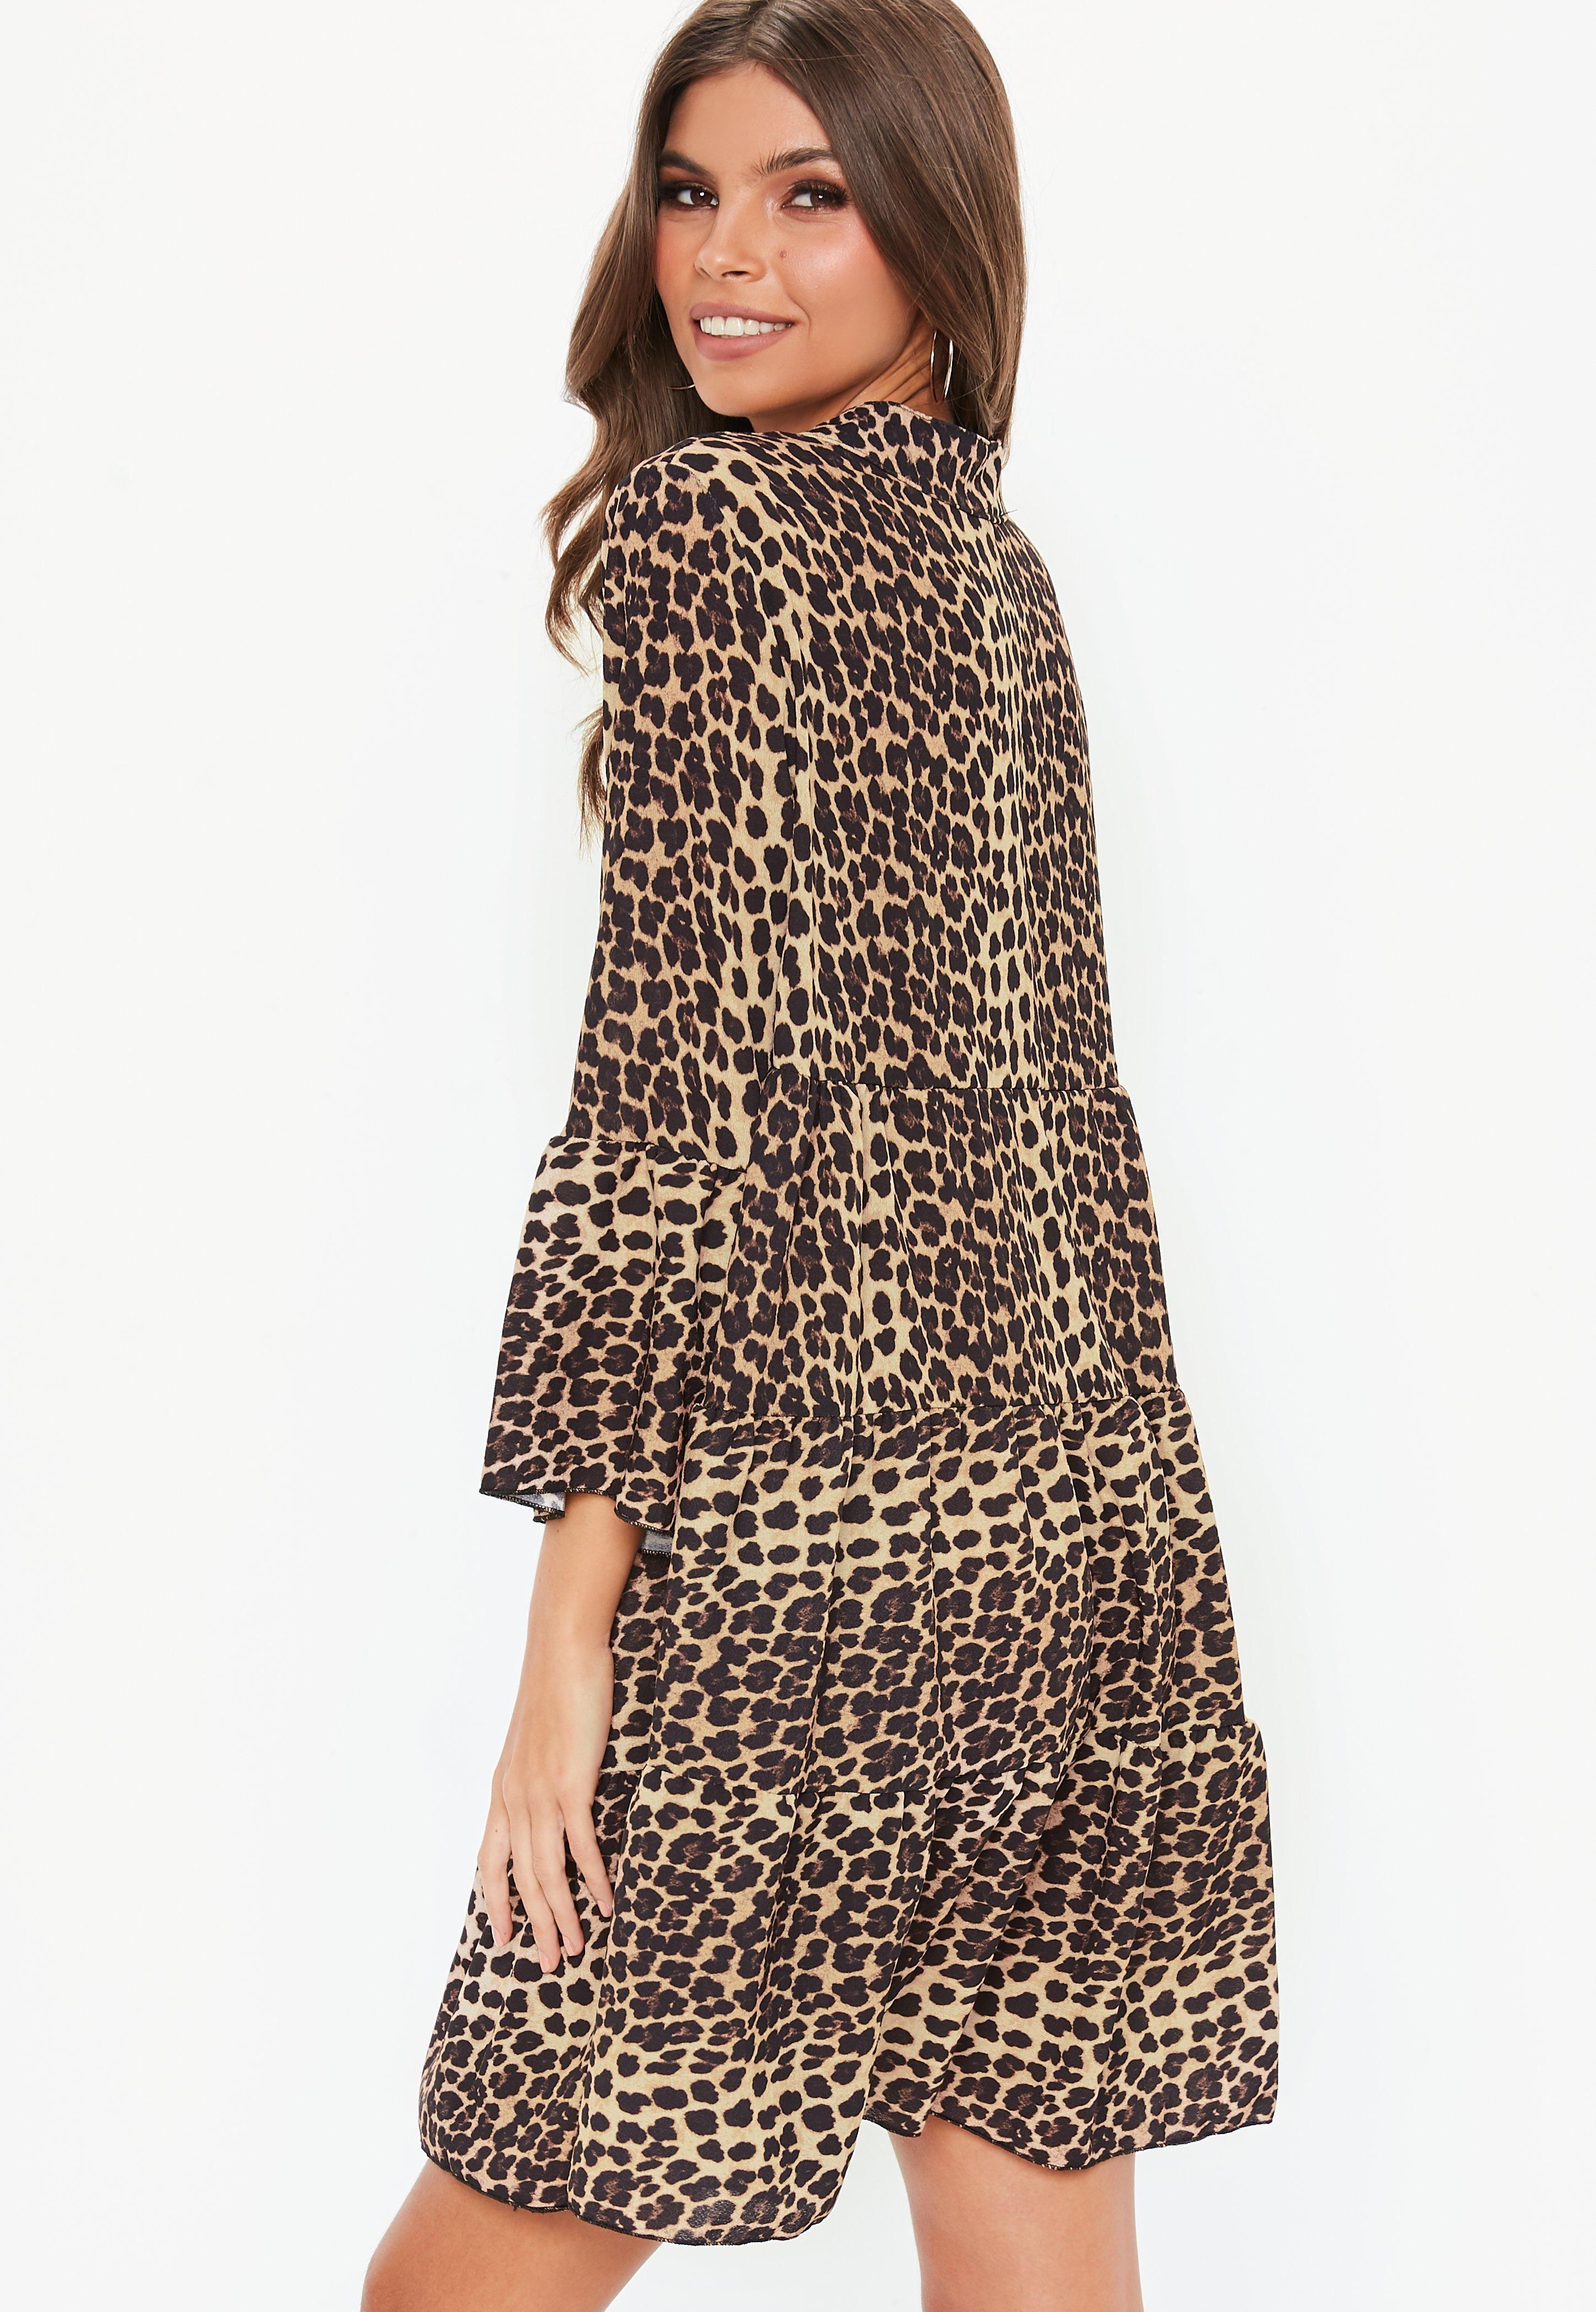 baa4130cf8c3 Brown Leopard Print Long Sleeve Smock Dress #Sponsored #Print, #SPONSORED, # Leopard, #Brown